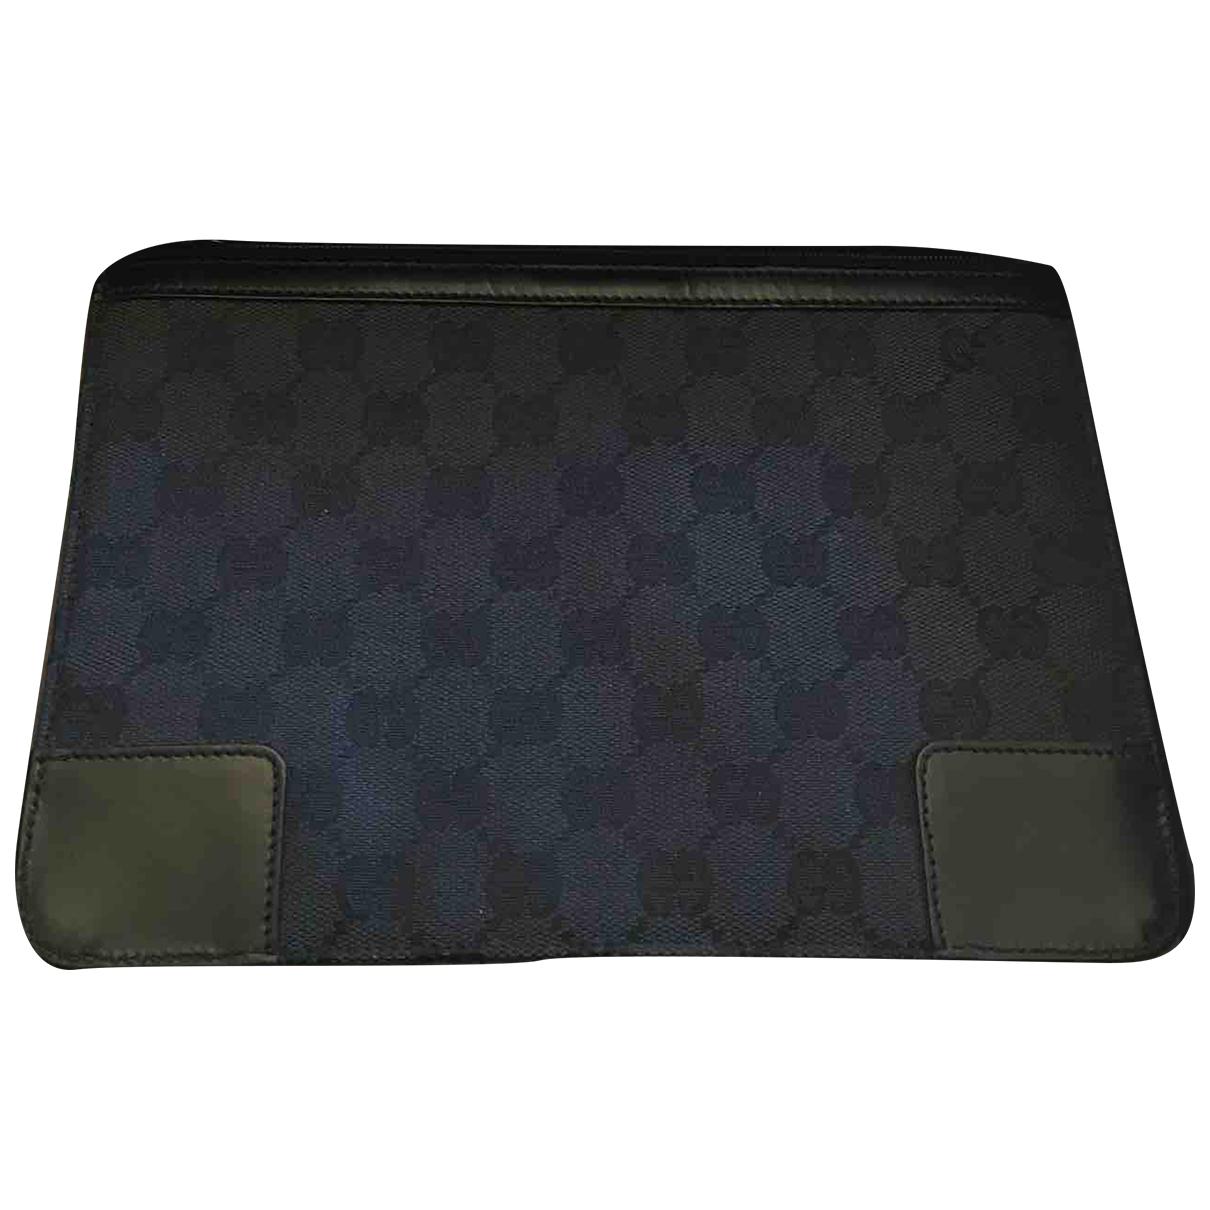 Bolsos clutch en Algodon Negro Gucci